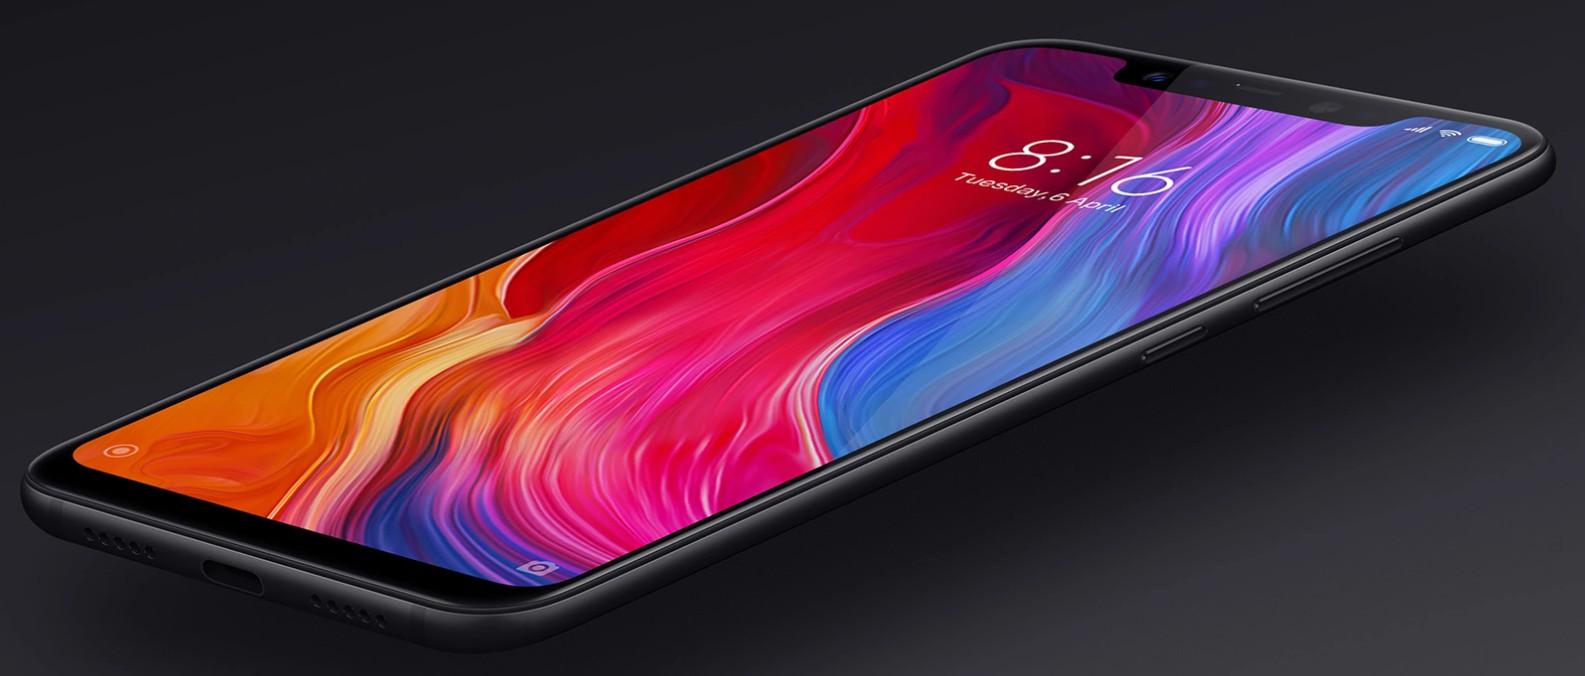 "Xiaomi Mi 8, el ""iPhone X chino"" llega a España por 499 euros 30"